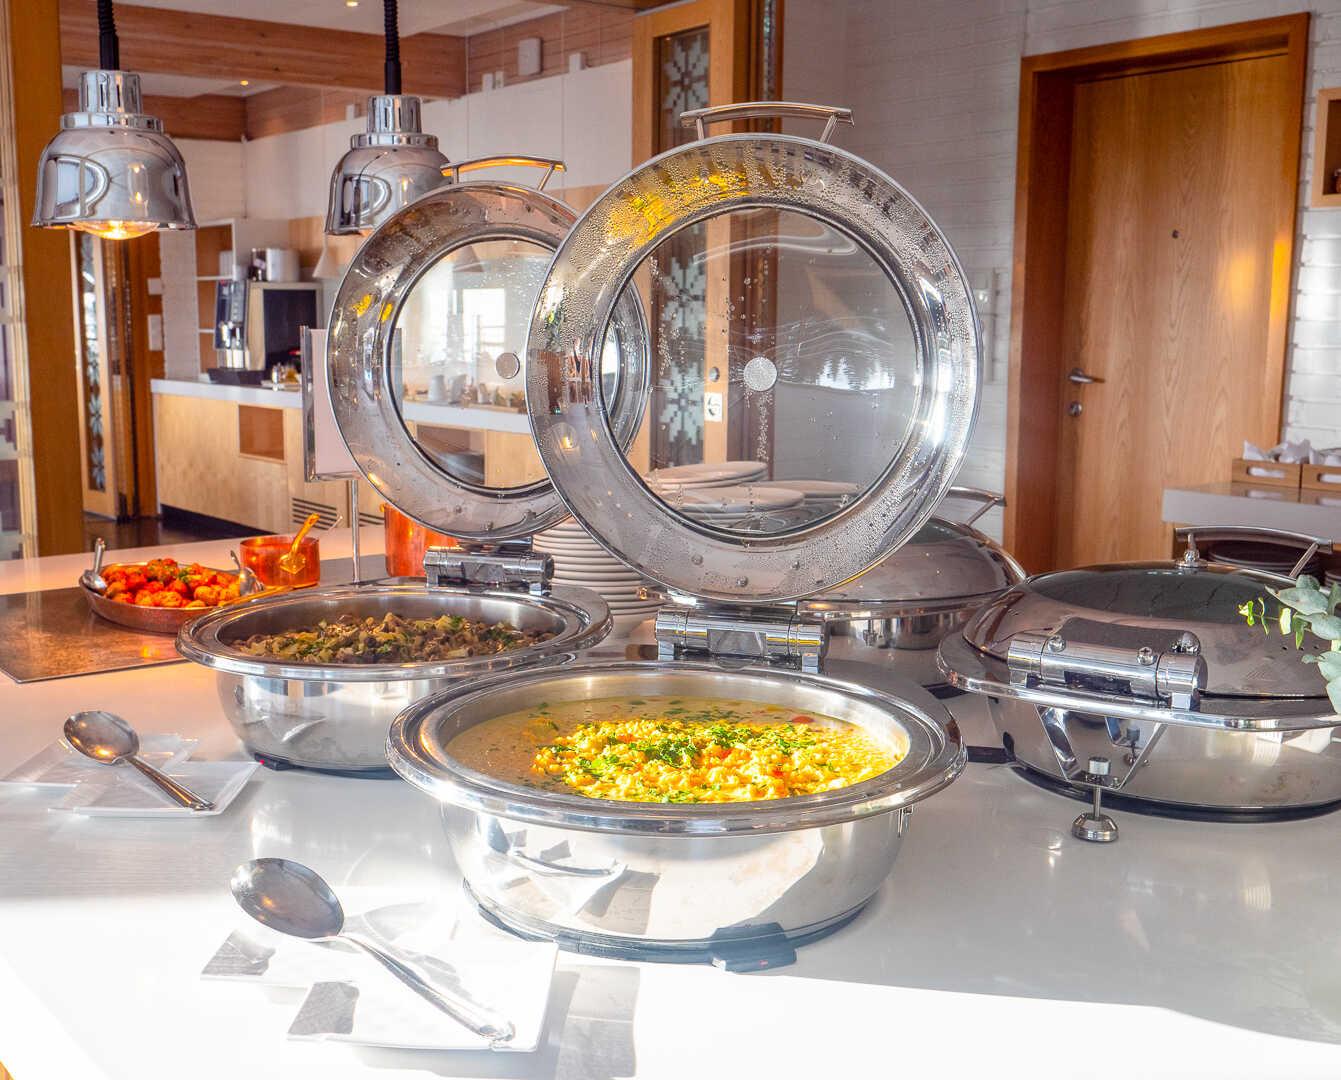 Buffet står klart i restaurant på Voksenåsen